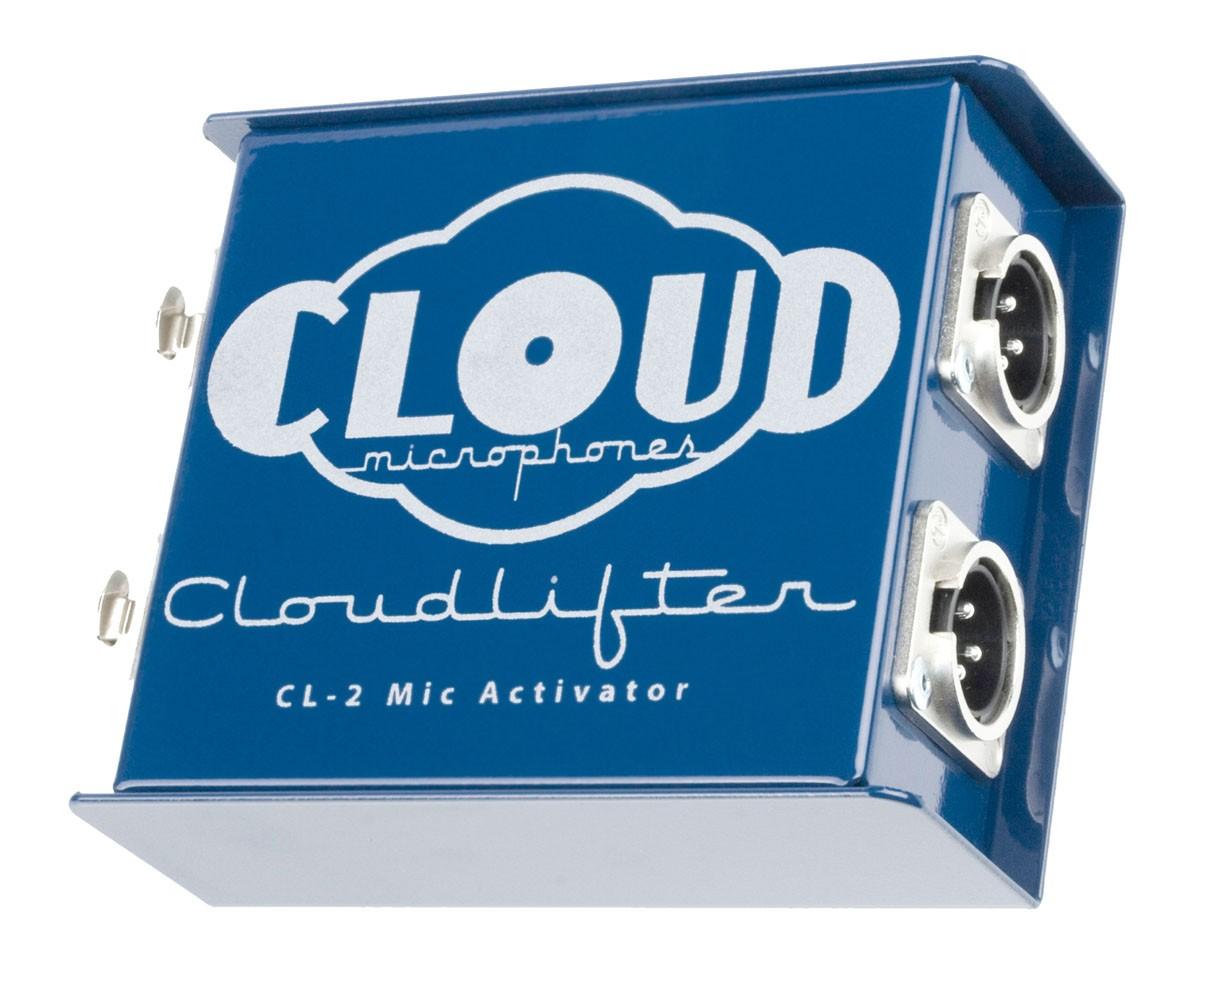 Cloud CL-2 Cloud Lifter